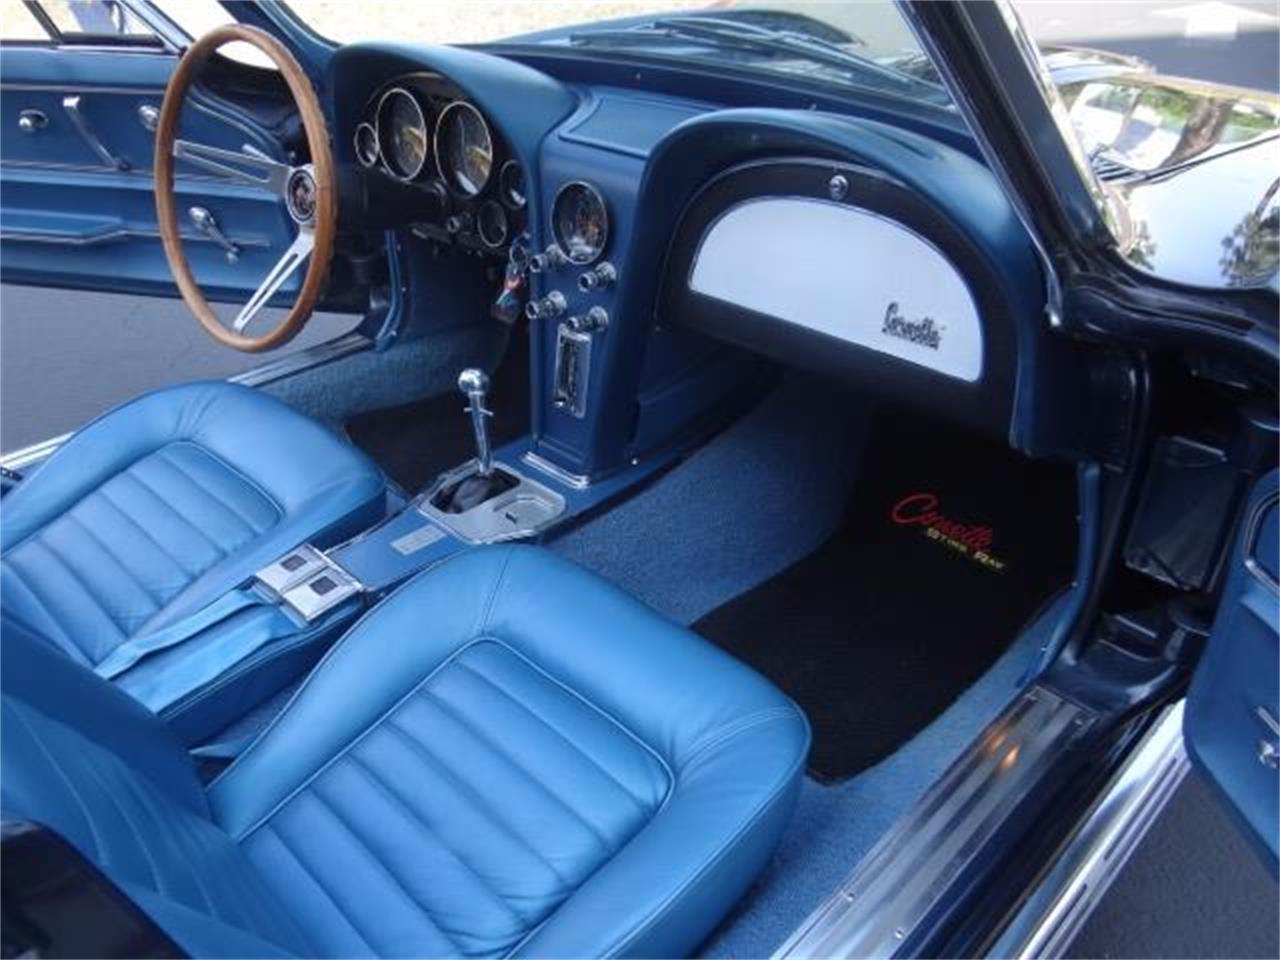 Large Picture of '66 Corvette located in Anaheim California - $65,000.00 - LEPG